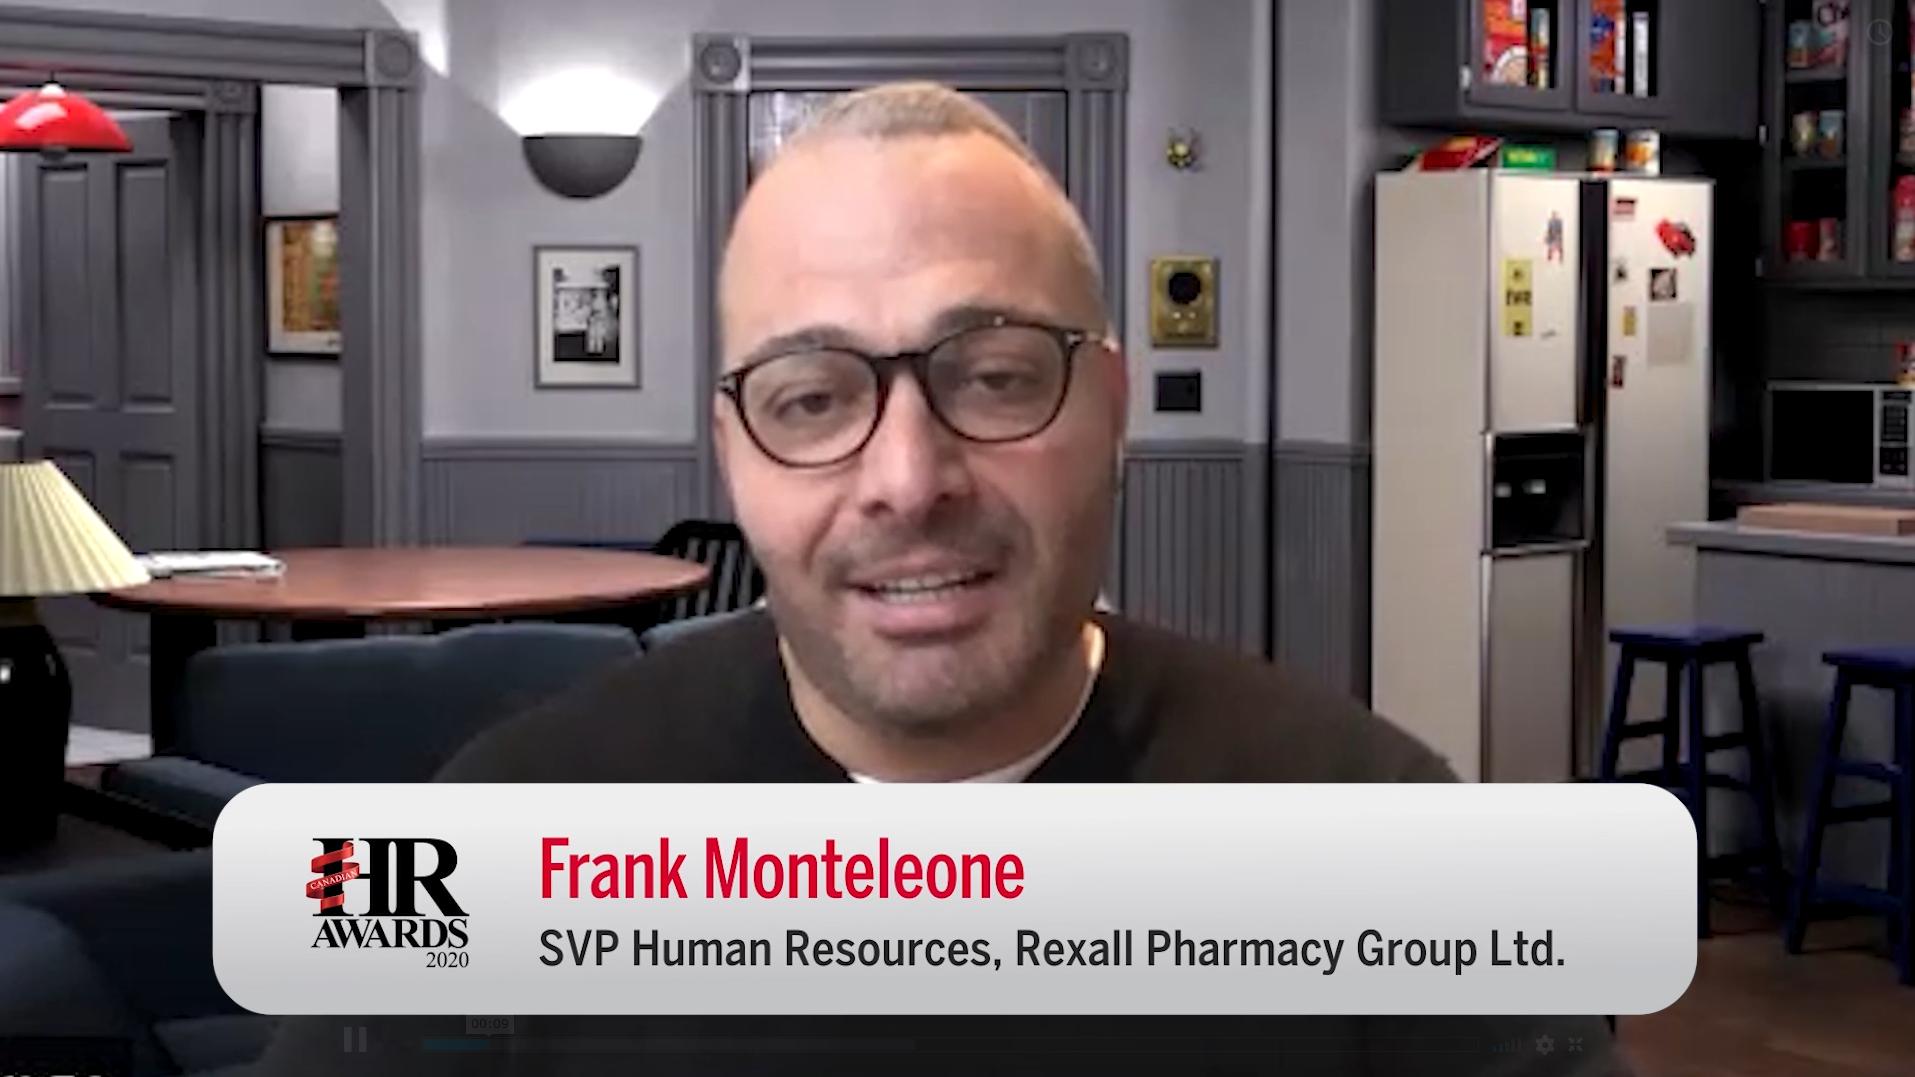 VIDEO: Frank Monteleone, SVP HR at Rexall